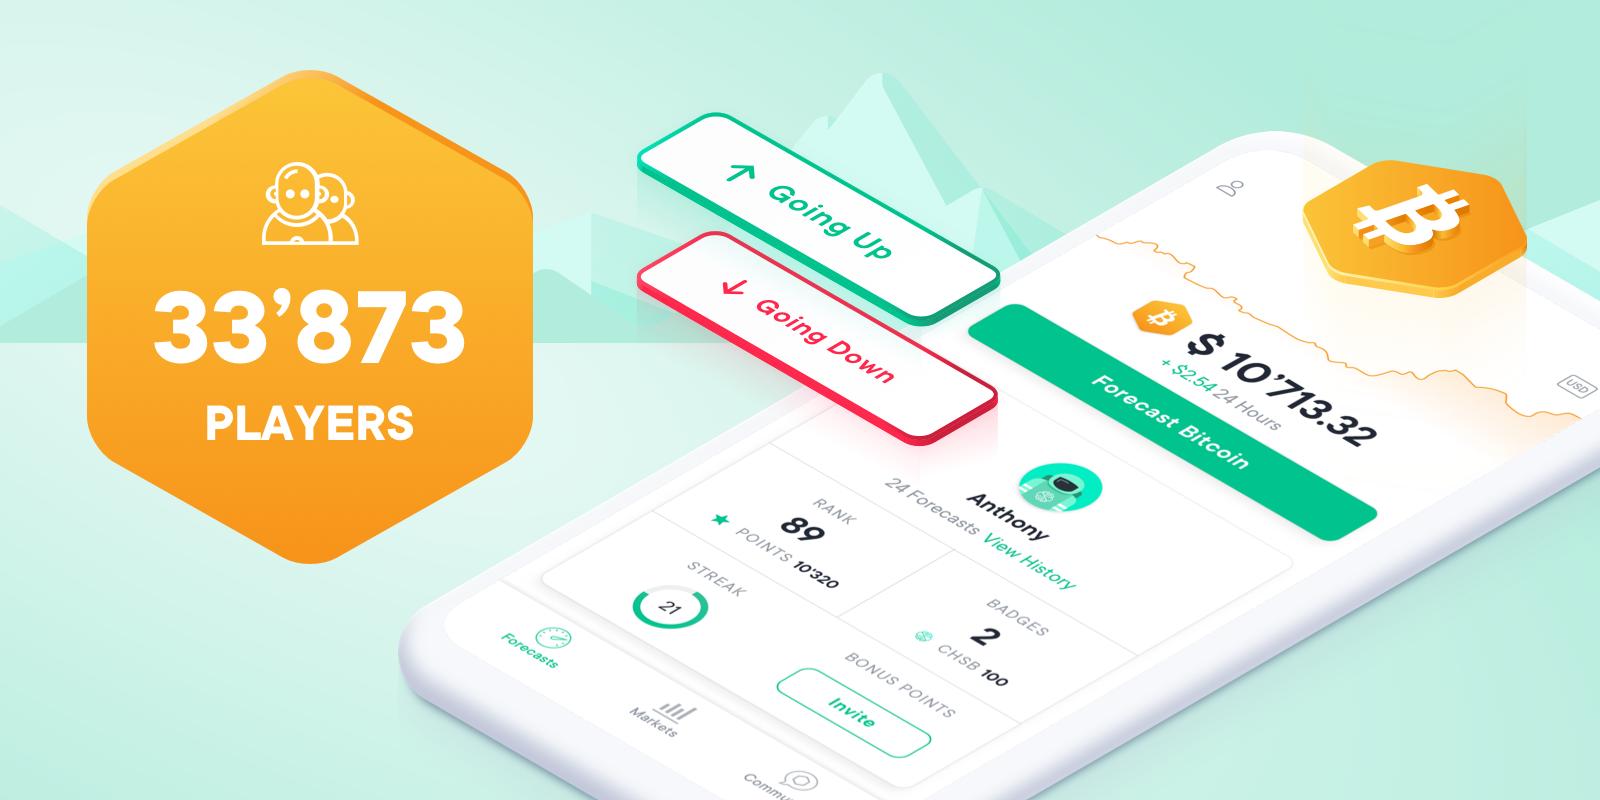 SwissBorg Community app players